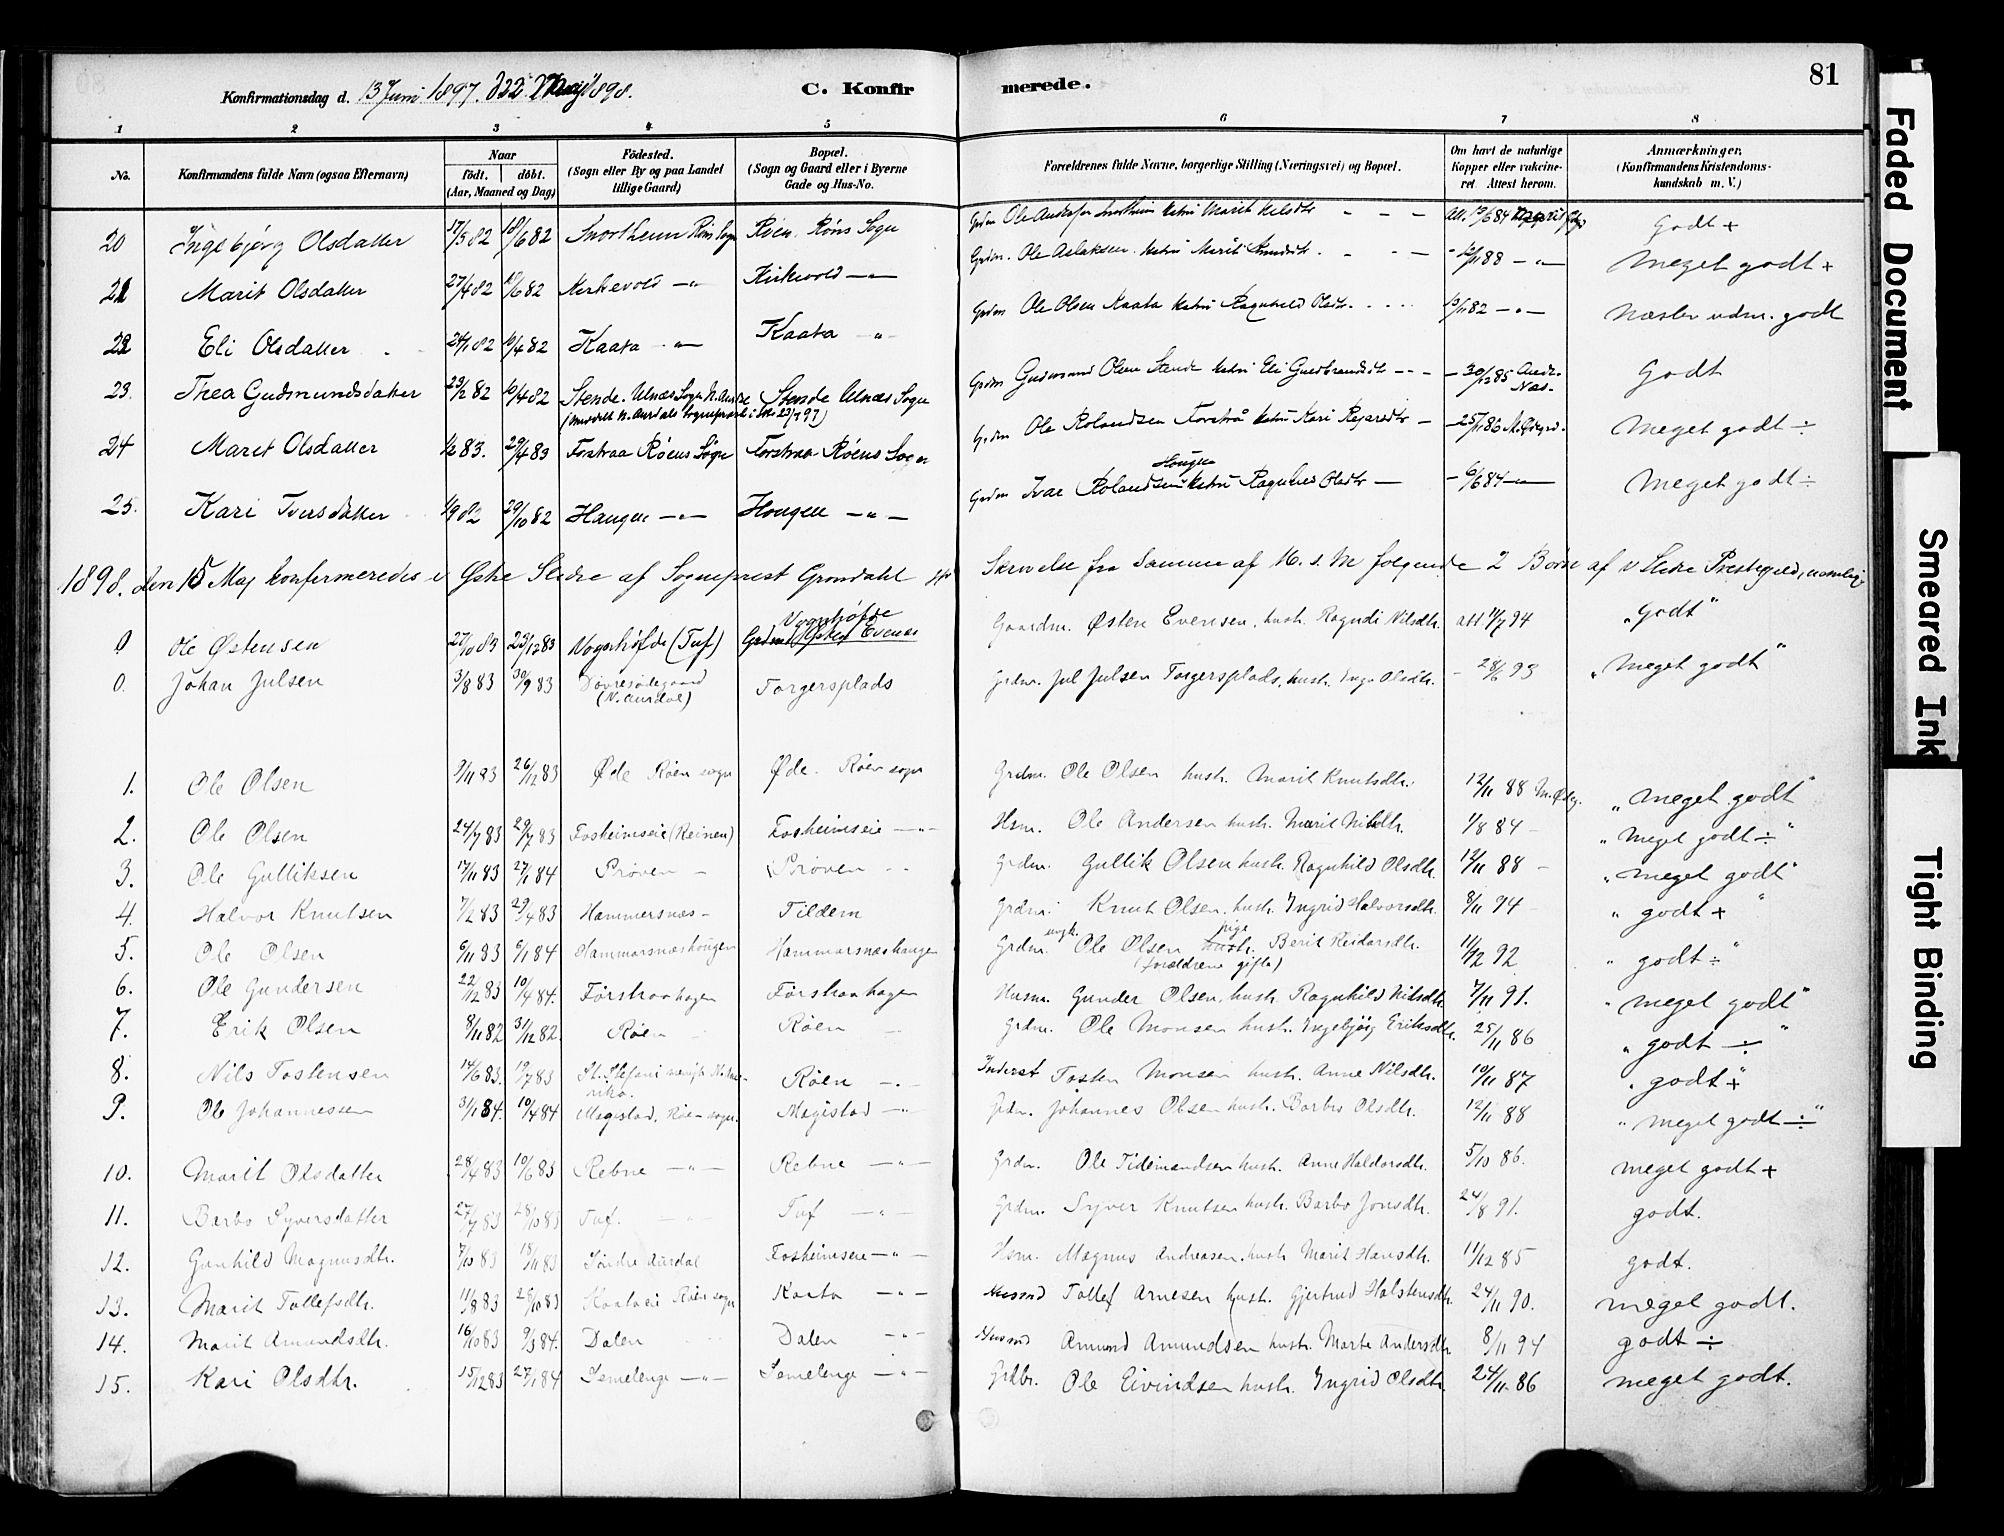 SAH, Vestre Slidre prestekontor, Ministerialbok nr. 6, 1881-1912, s. 81